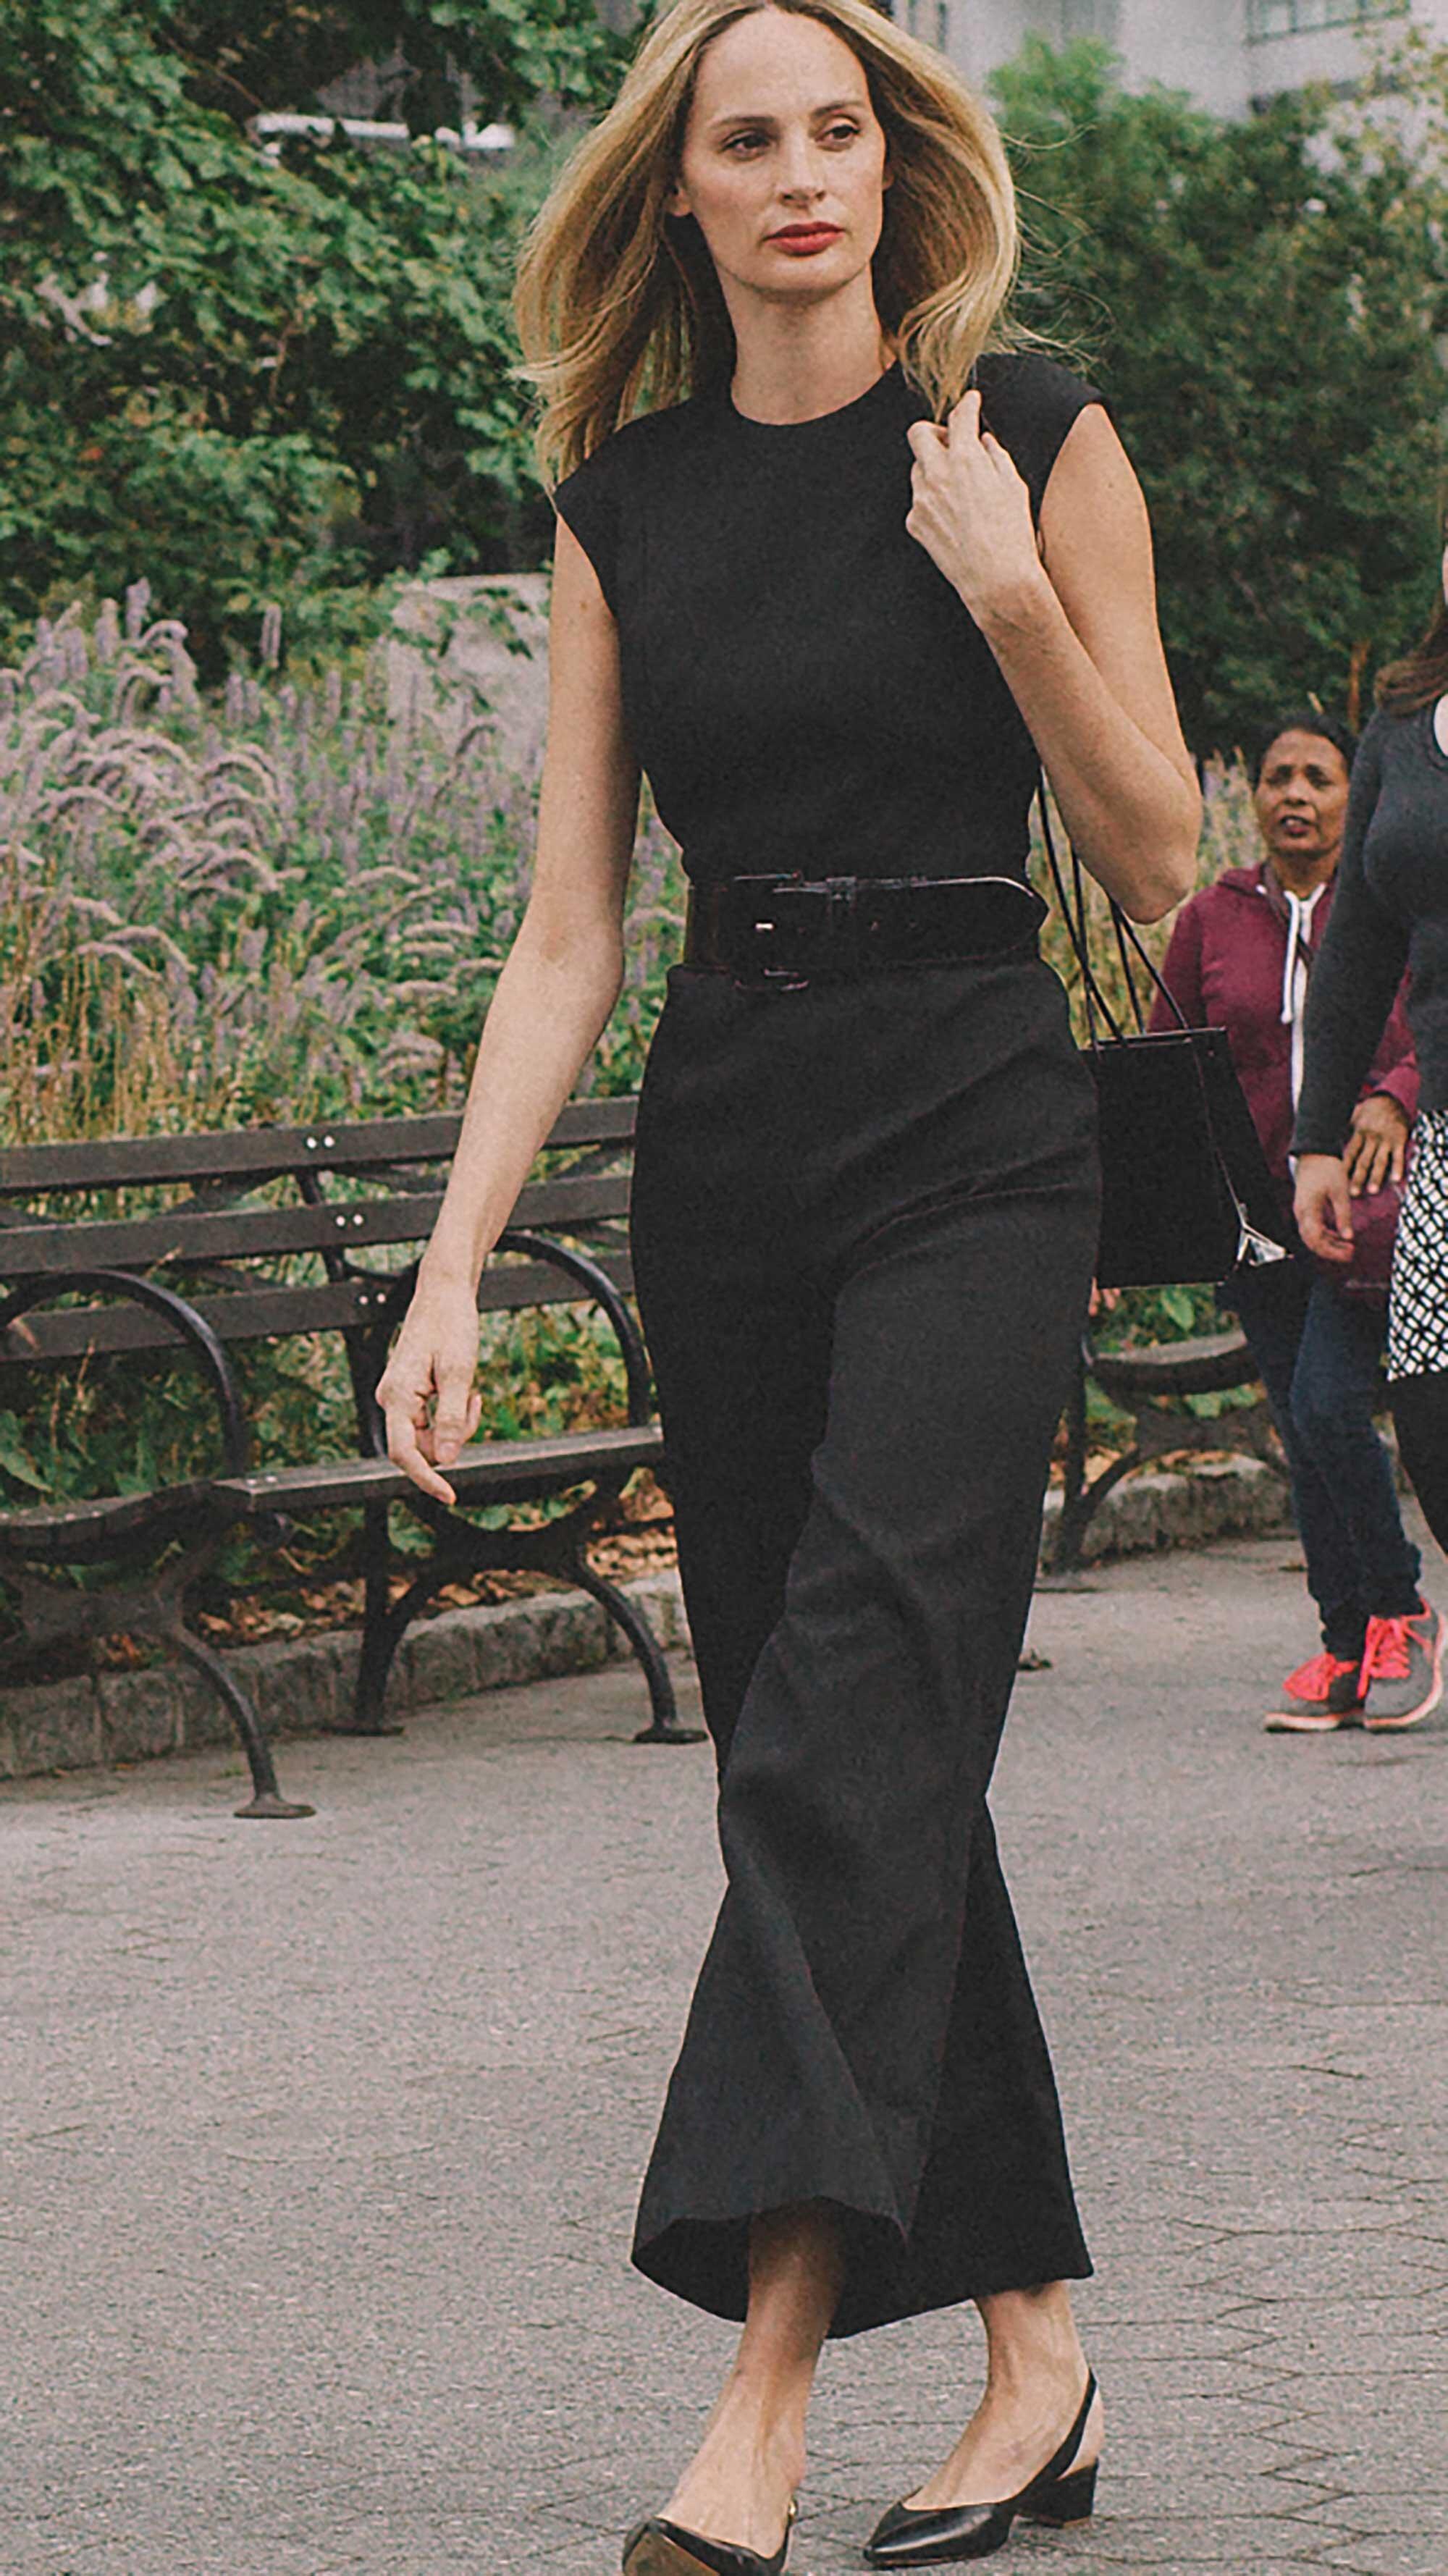 Click for more looks! Best outfits of New York Fashion Week street style 2019 Day Three Photo by @J2martinez Jose J. Martinez www.jmrtnz.com -10.jpg